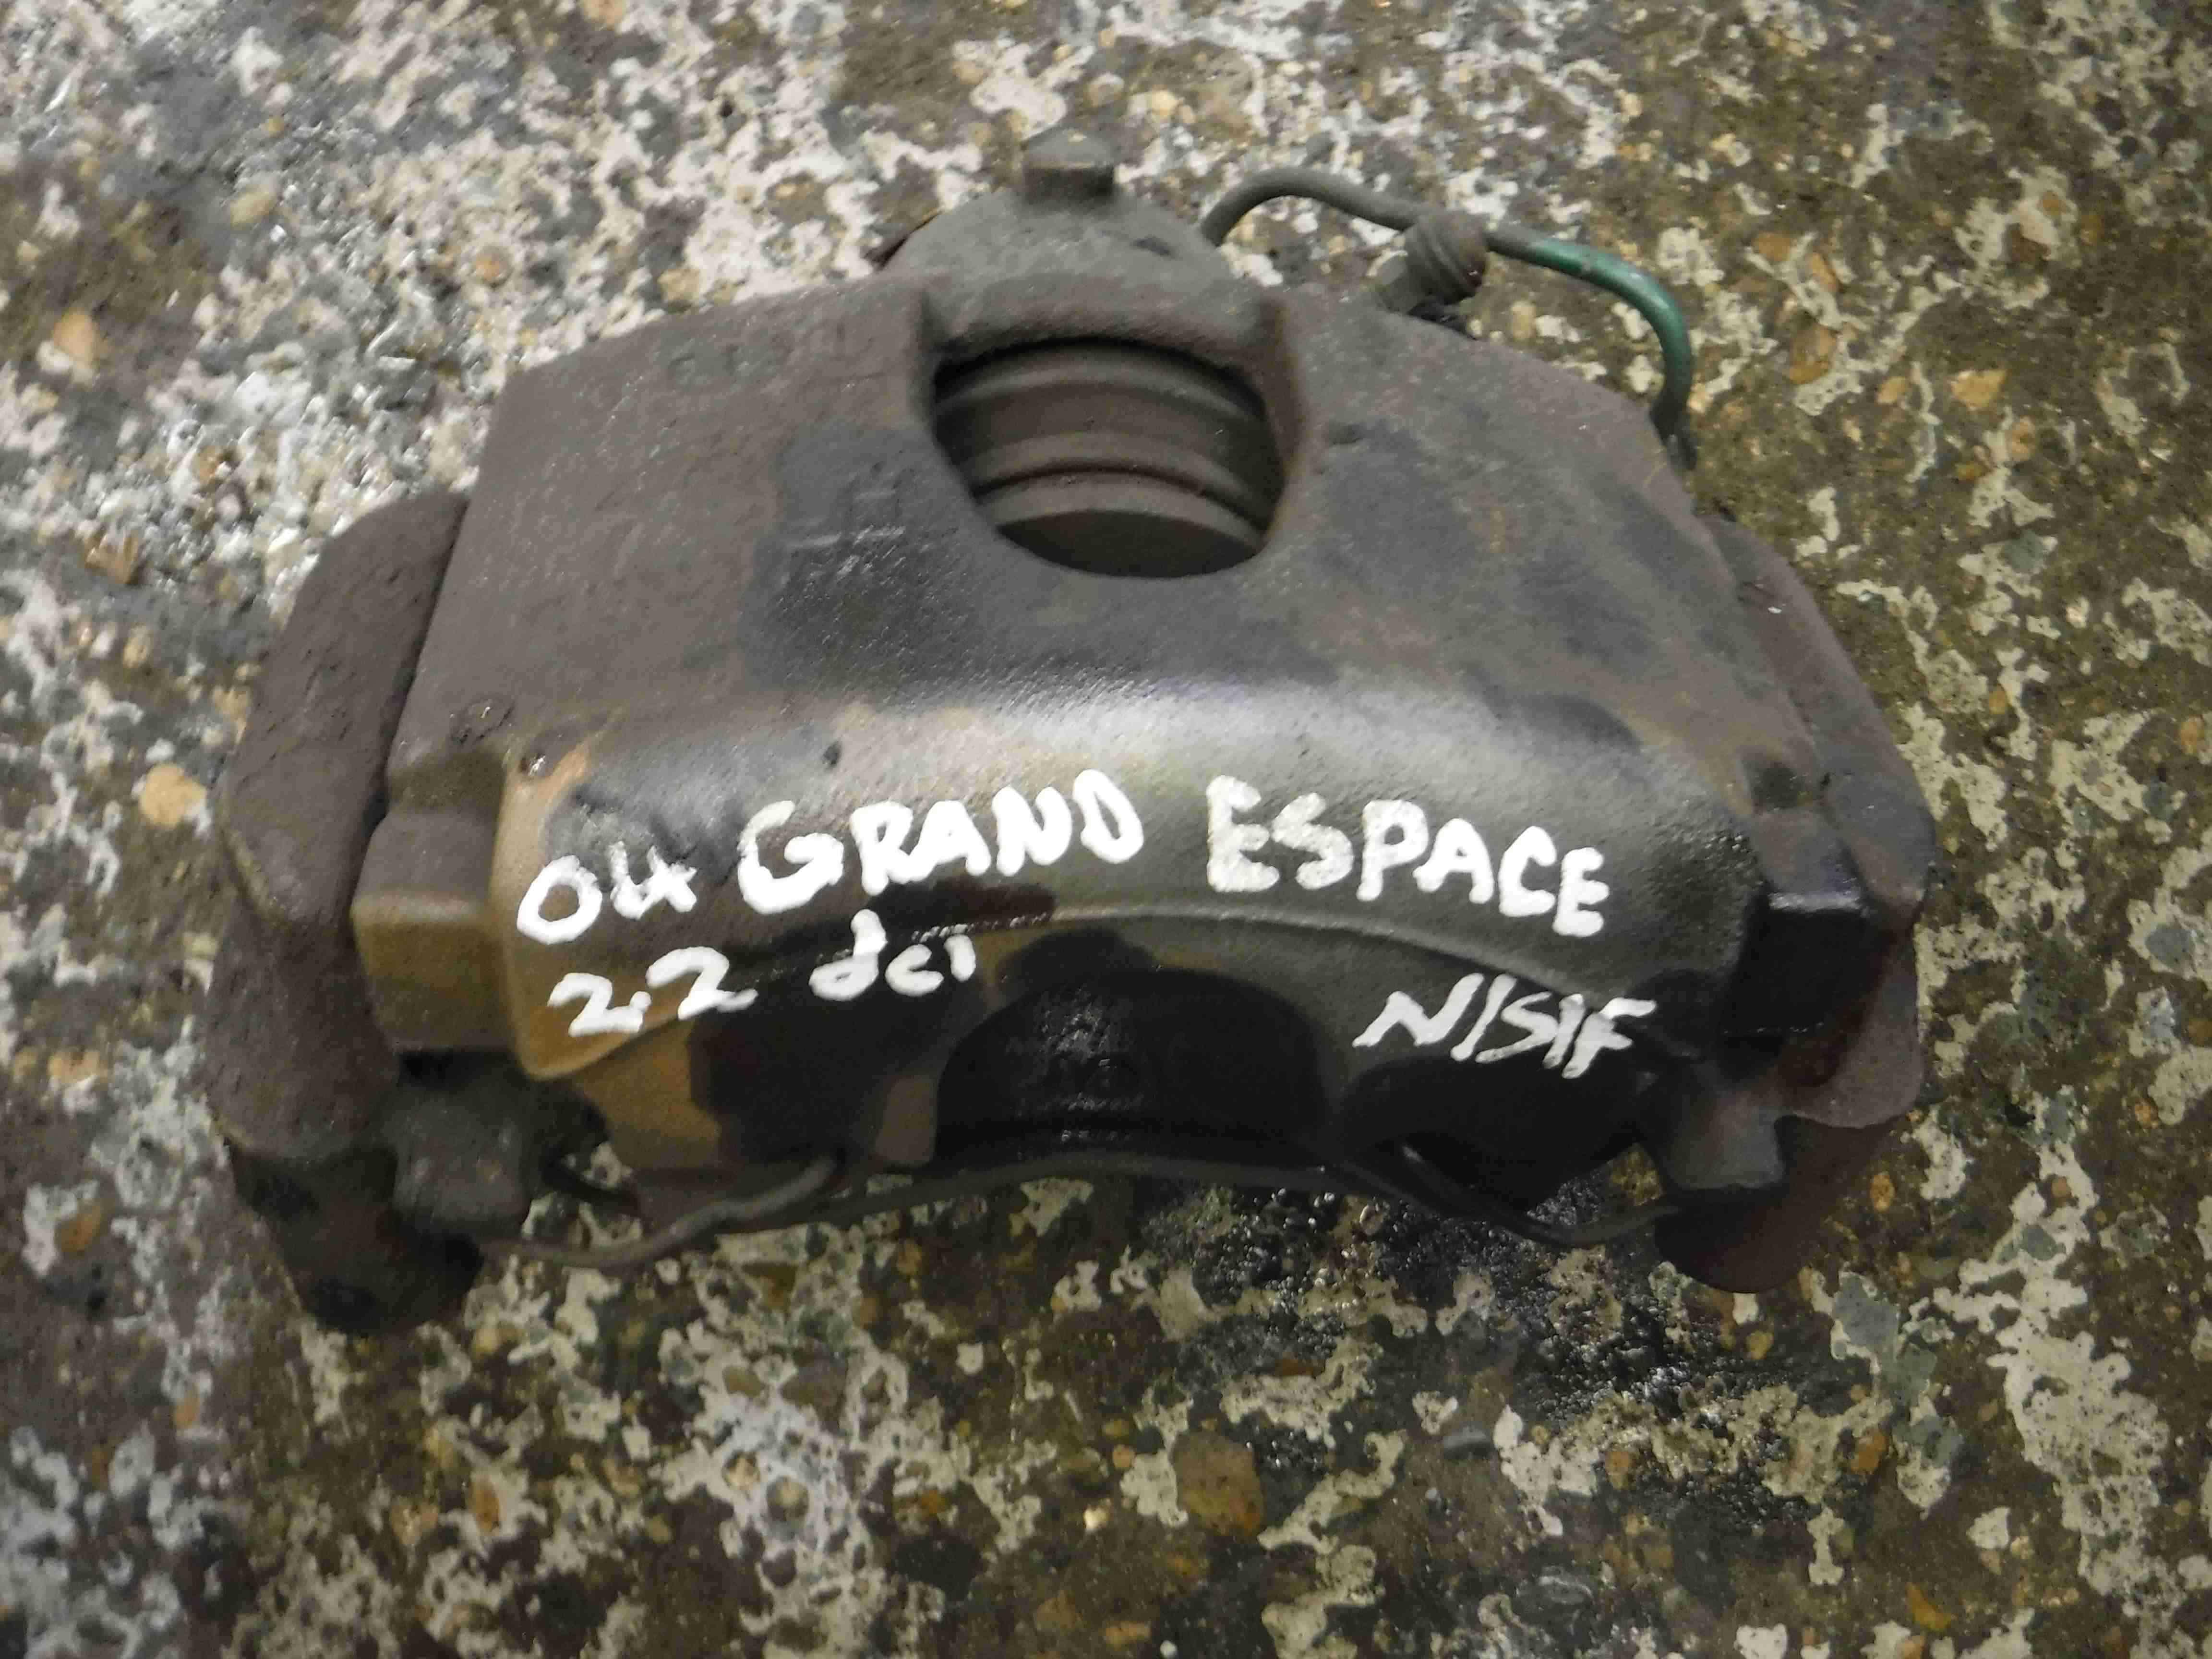 Renault Espace 2003-2013 2.2 dCi Passenger NSF Front Brake Caliper